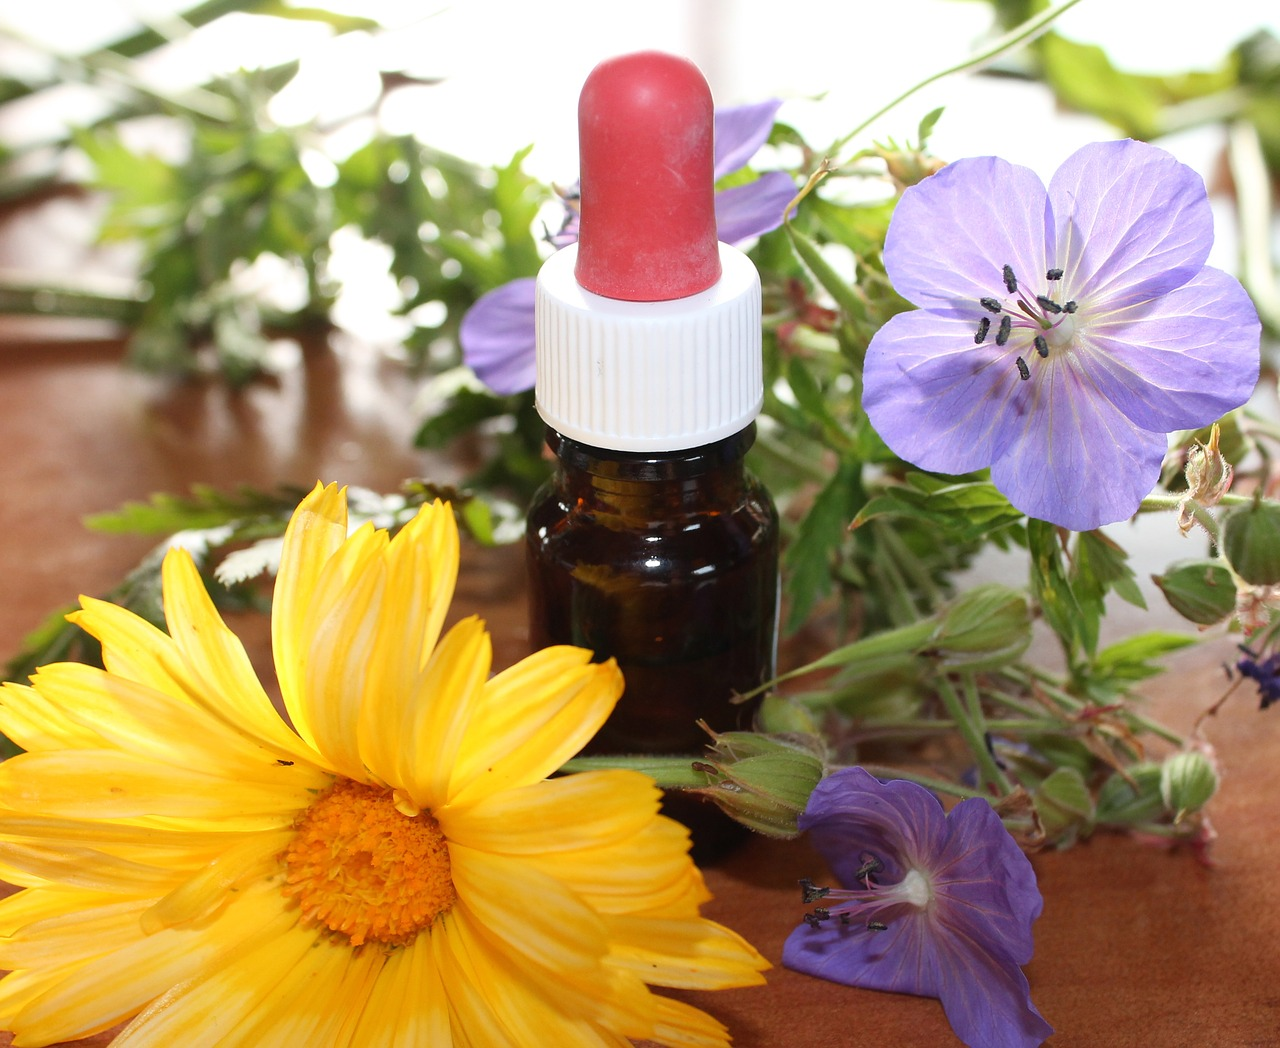 natural-medicine-1738161_1280.jpg